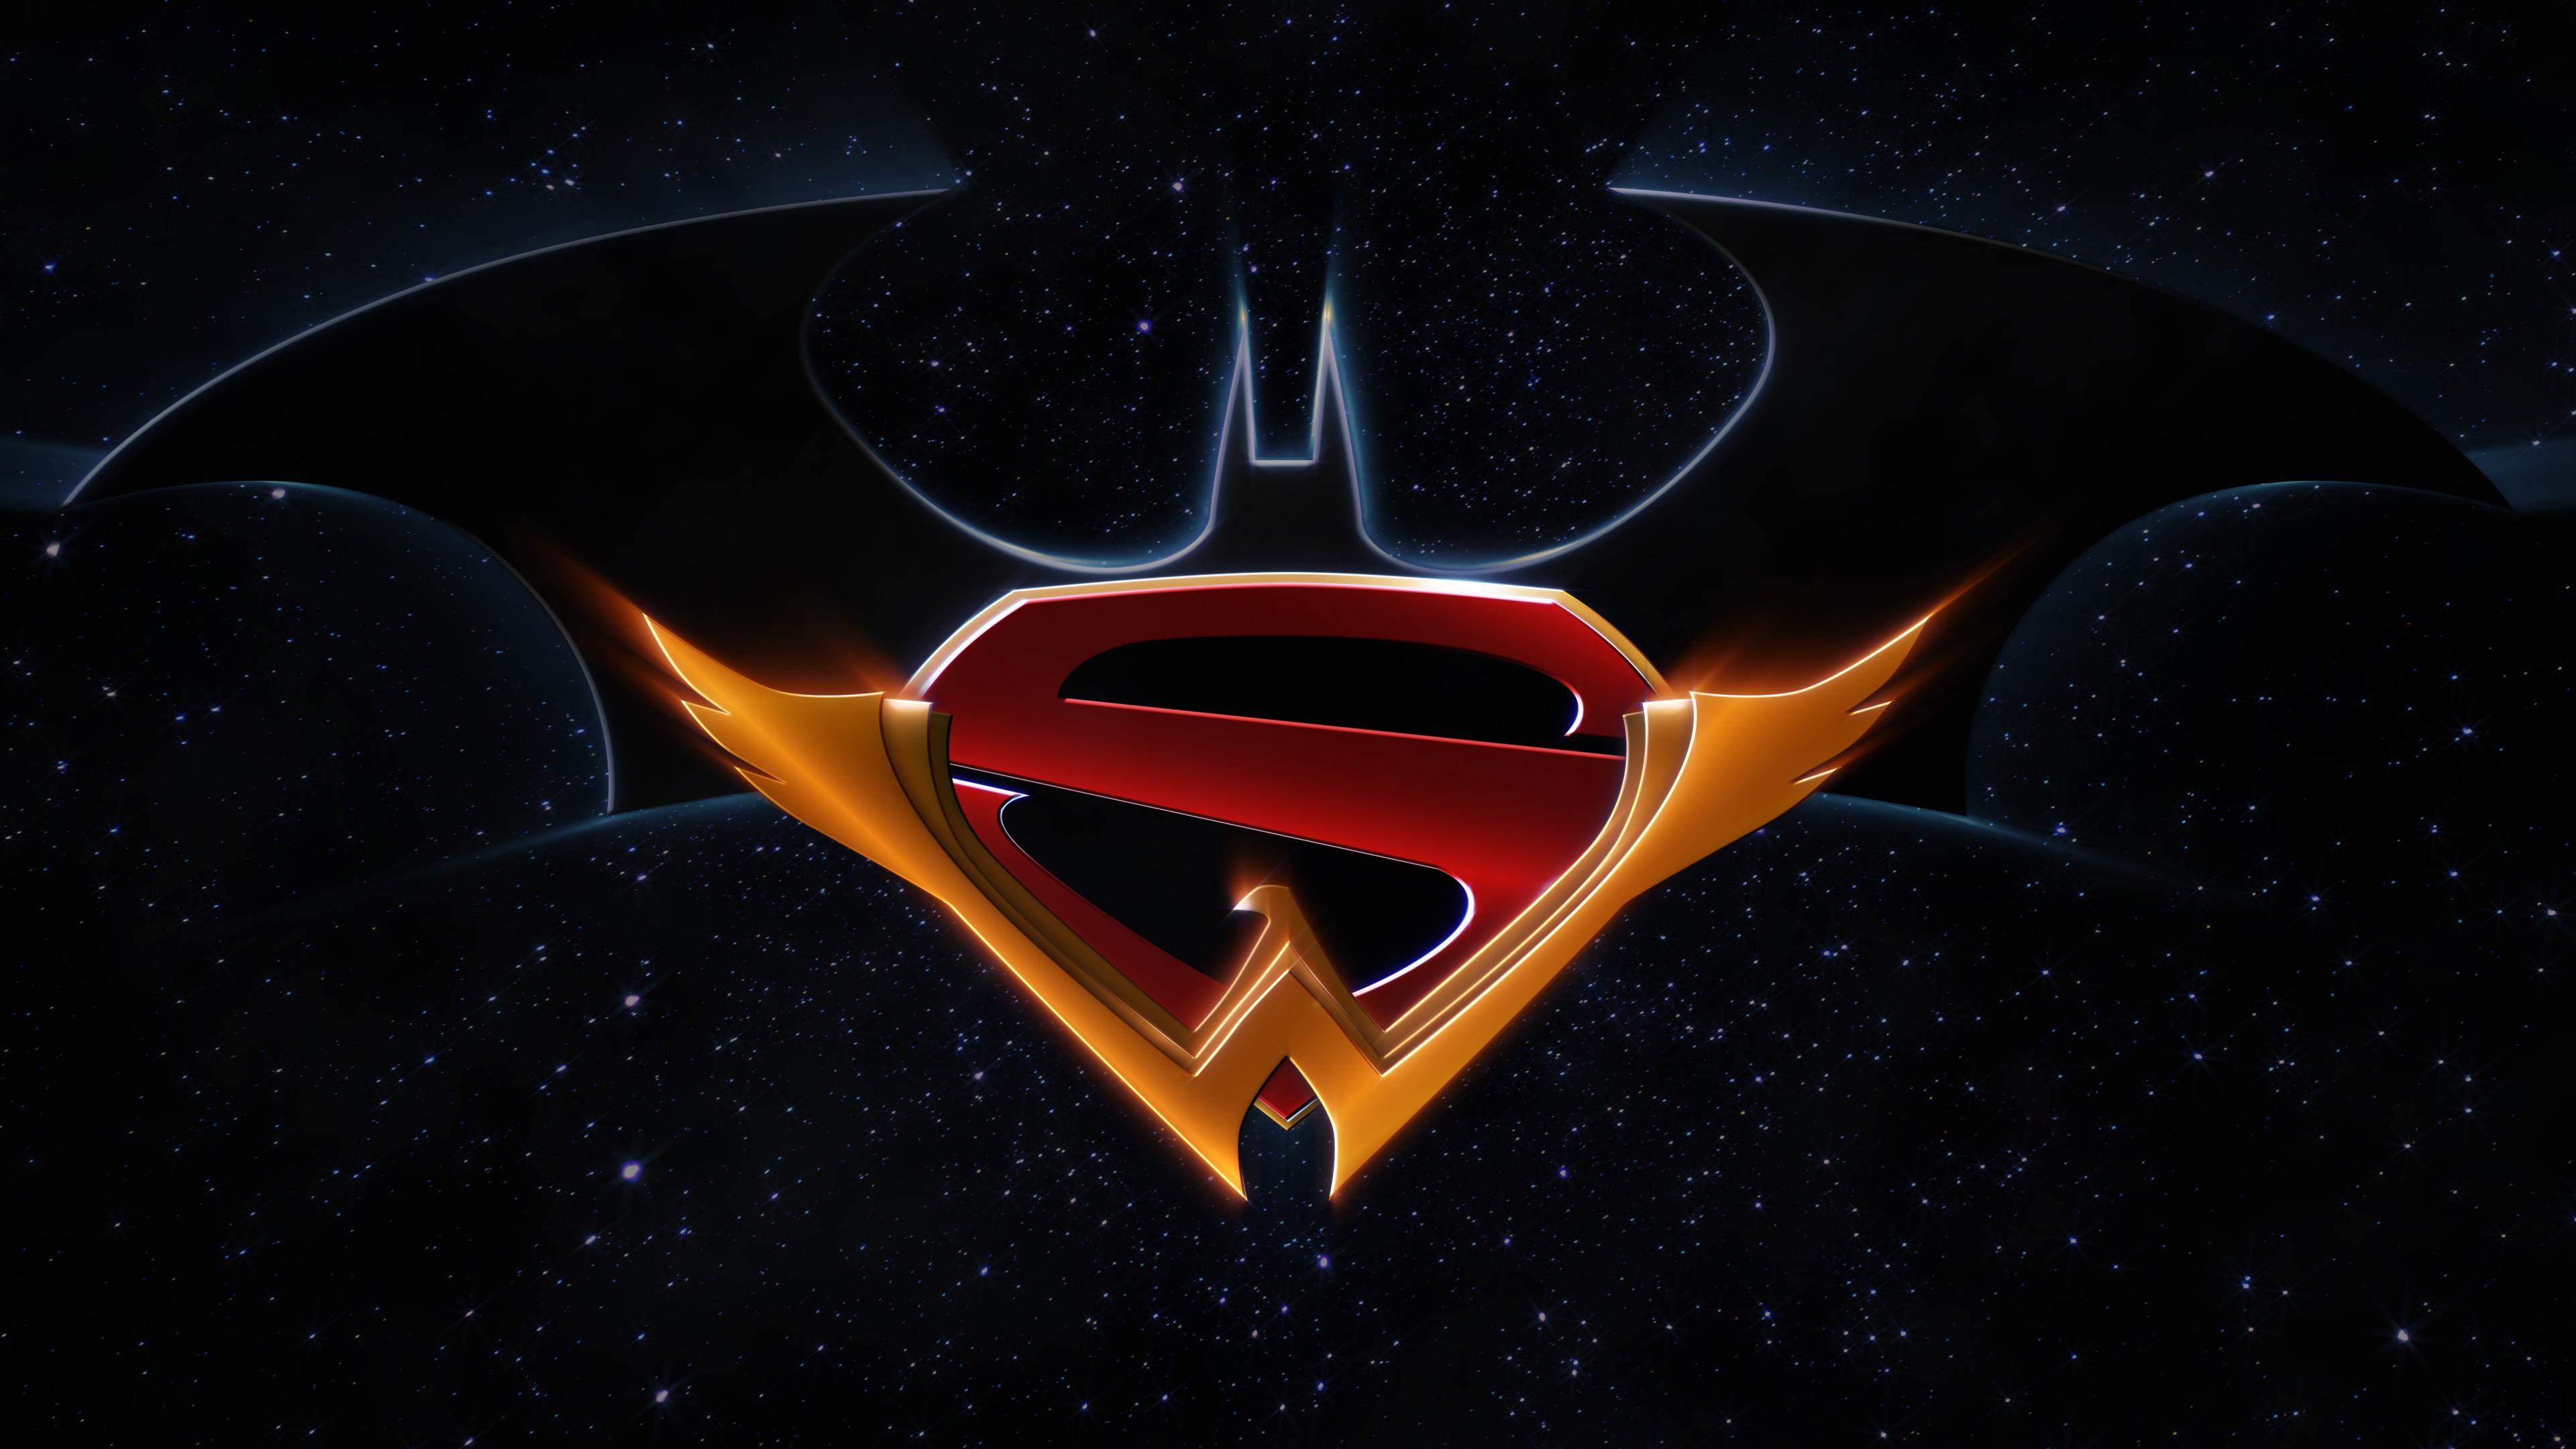 Wonder Woman Logo Wallpaper 61 Images: Batman Superman Wonder Woman Trinity Logo, HD Superheroes